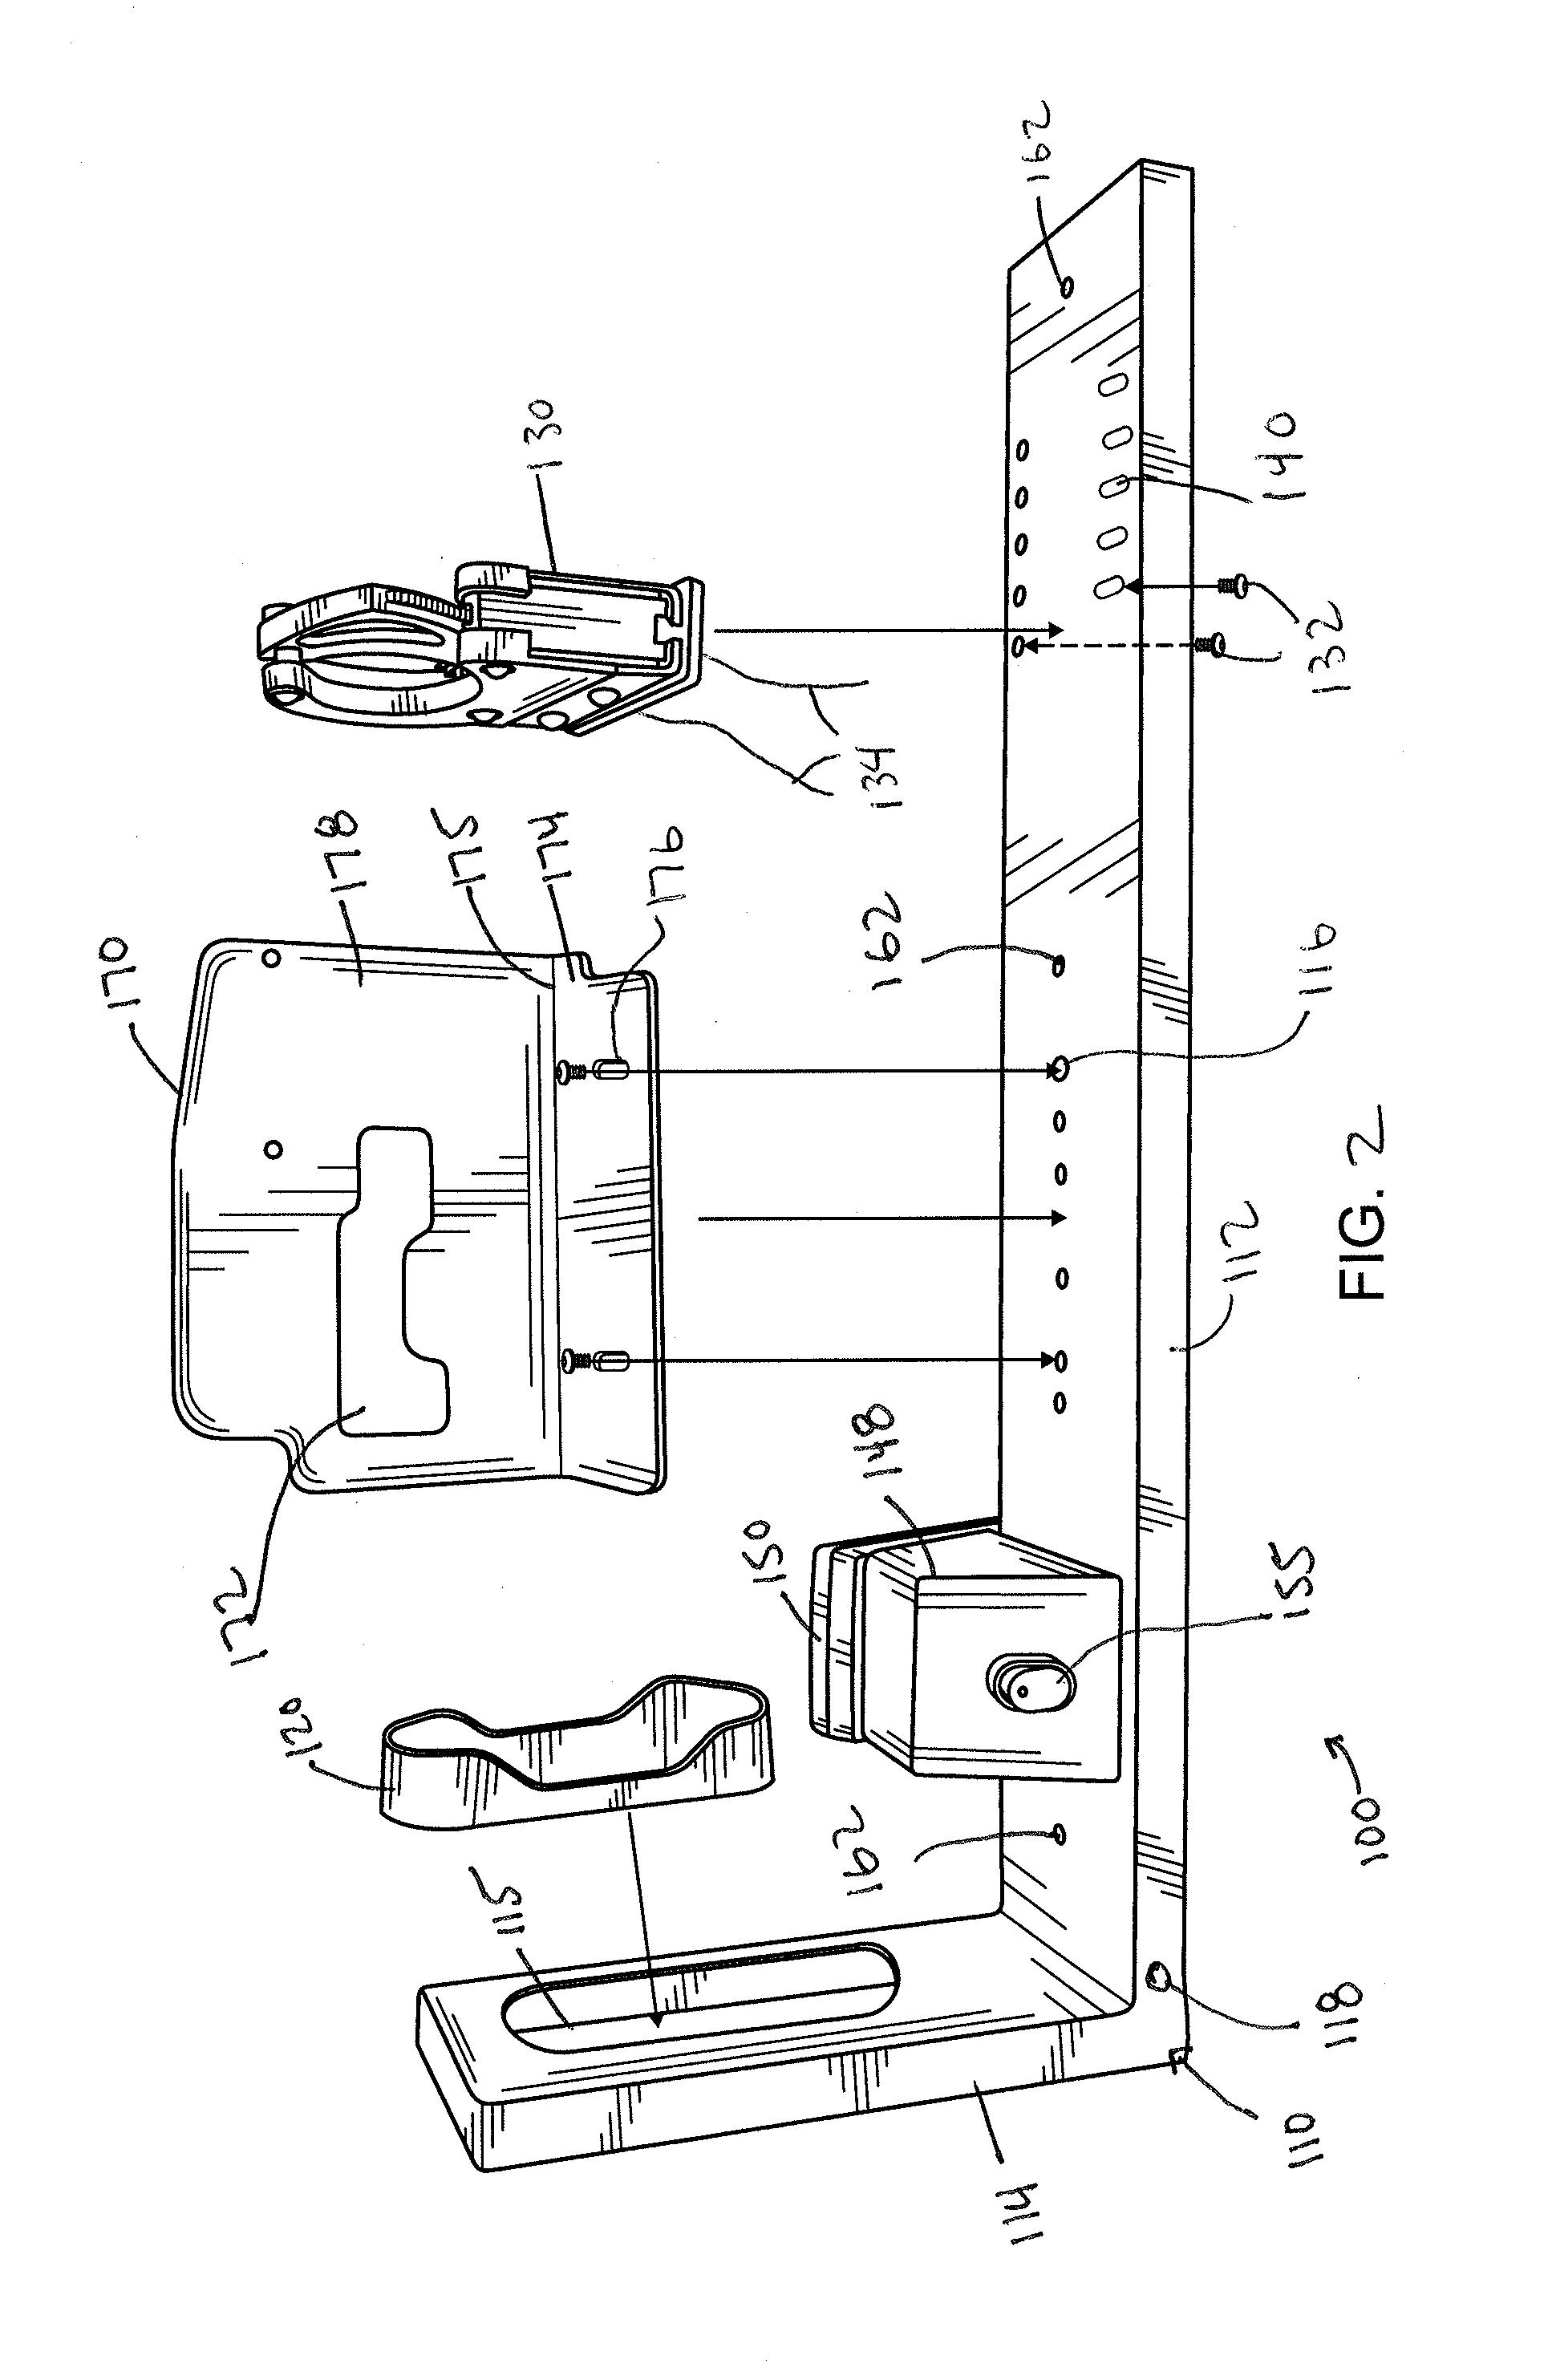 whelen pcc s9 wiring diagram whelen control box wiring